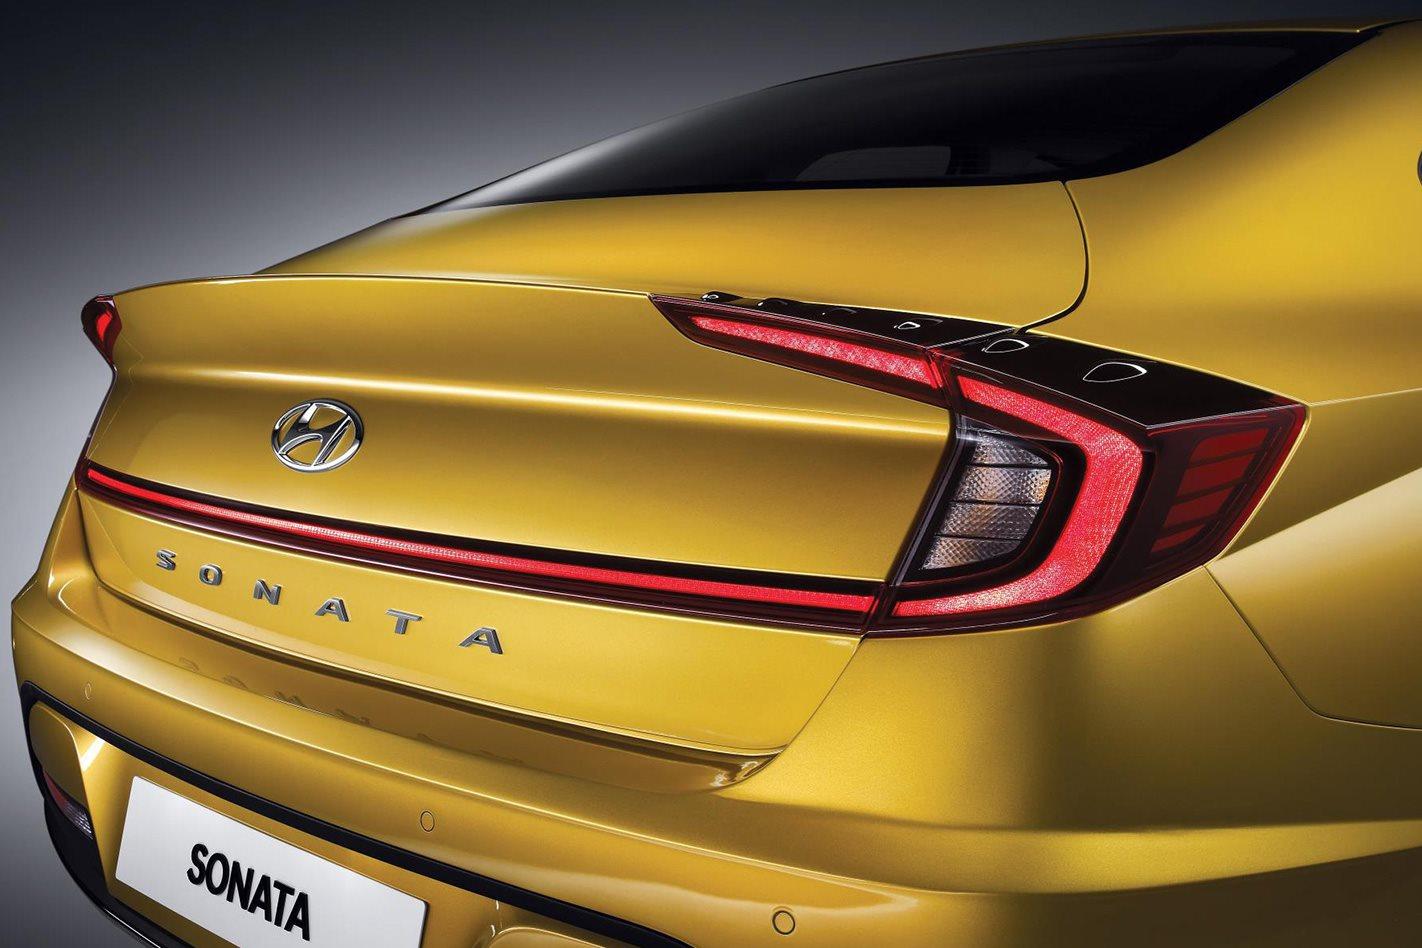 2020 Hyundai Sonata gets sexy